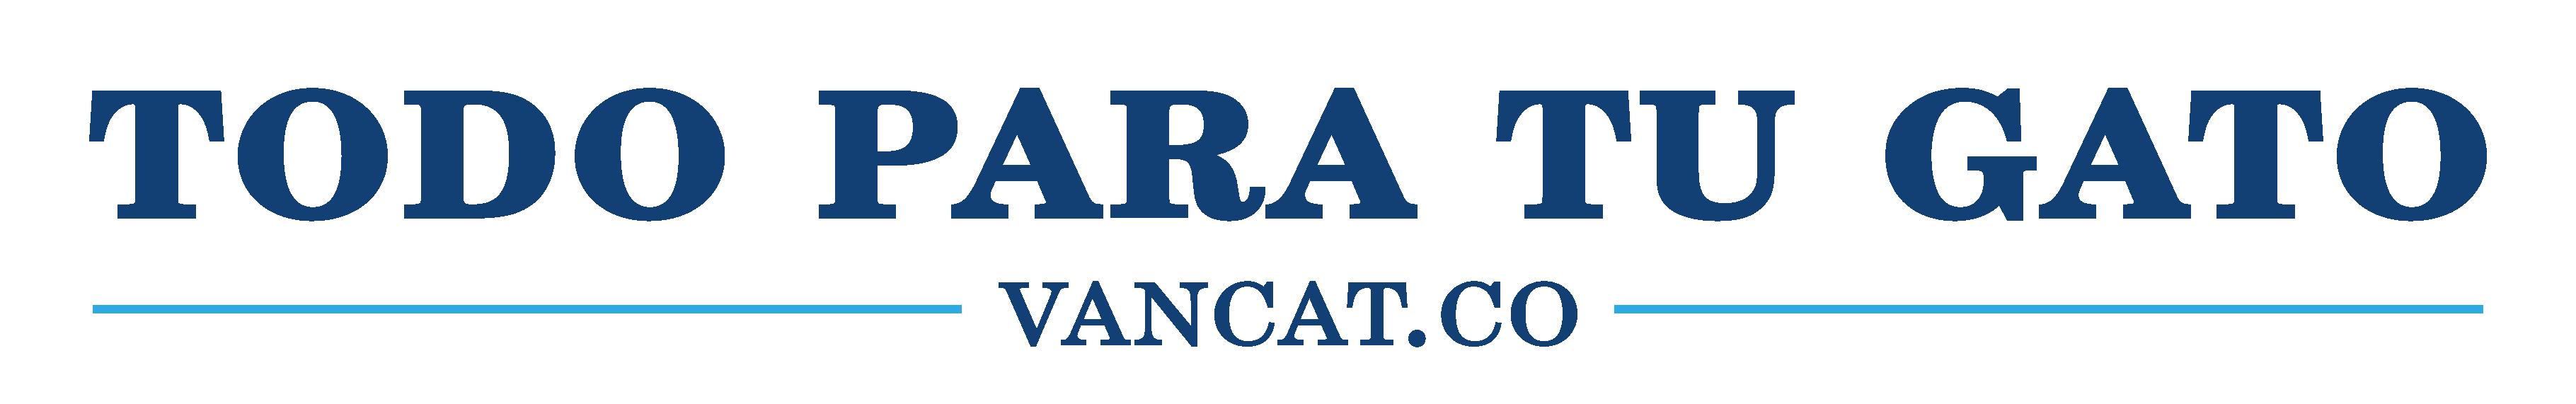 Van Cat | Todo para tu Gato